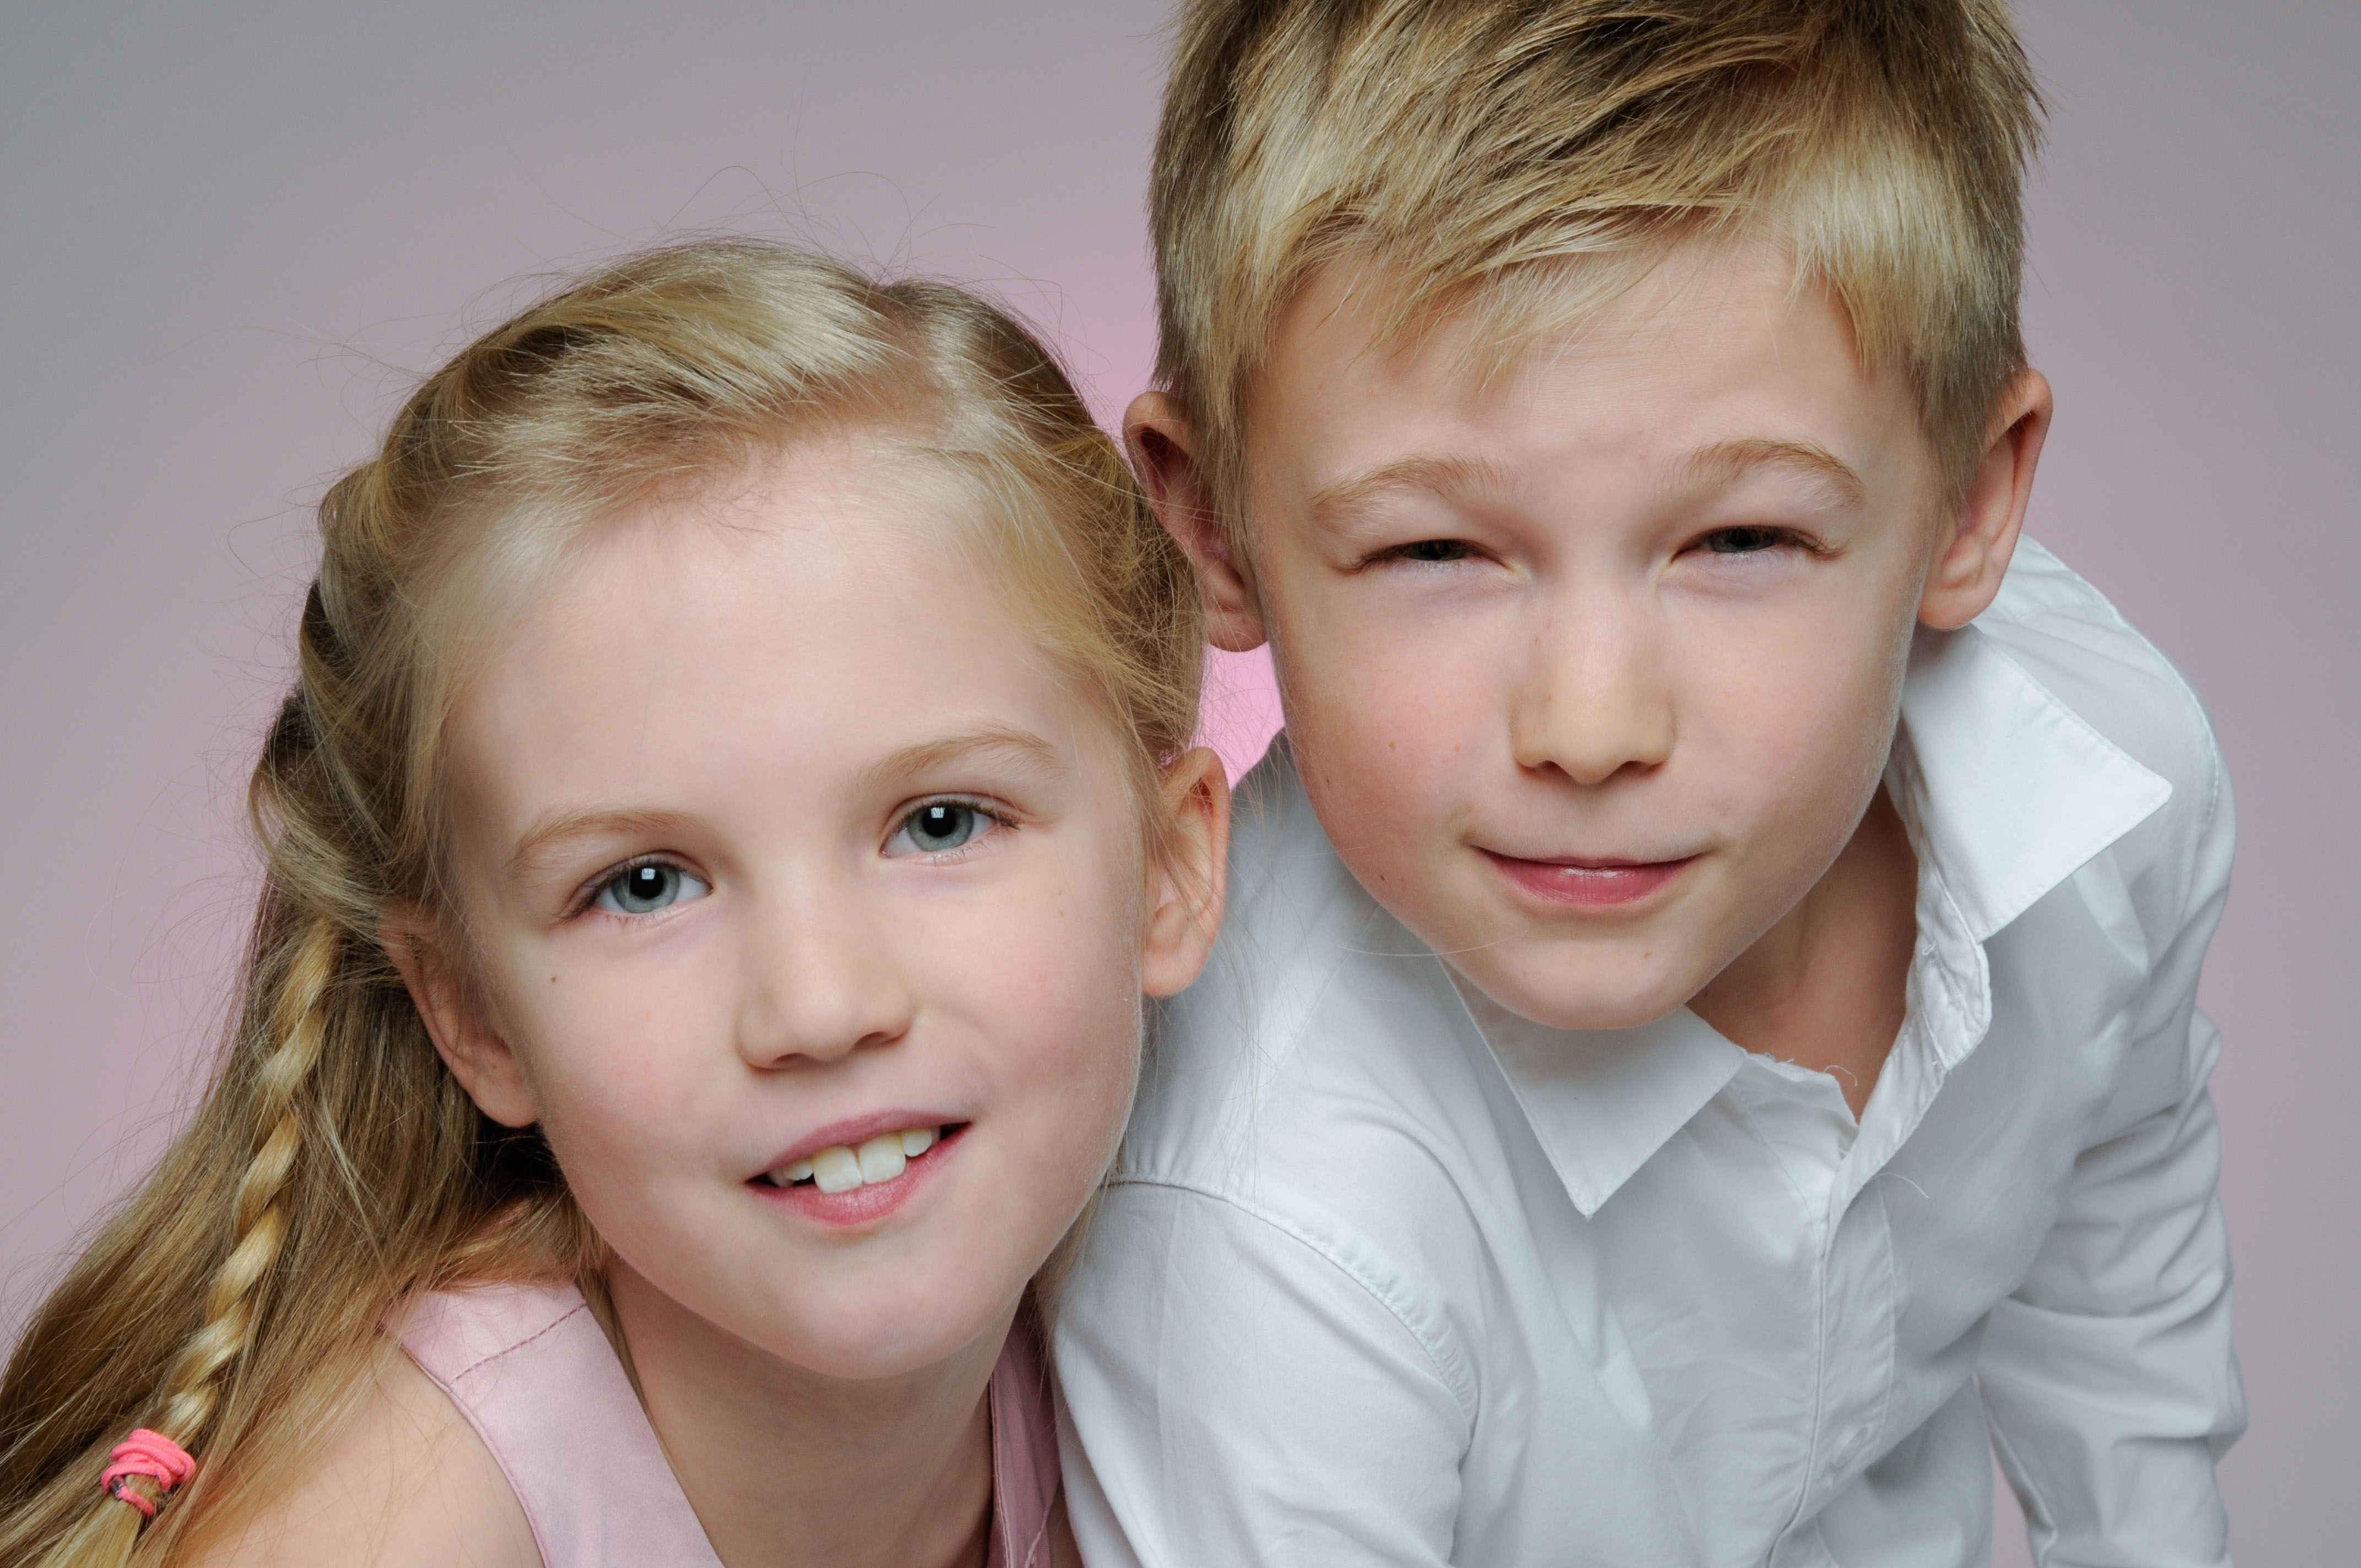 Kinderfotografie_Nadine Grenningloh014